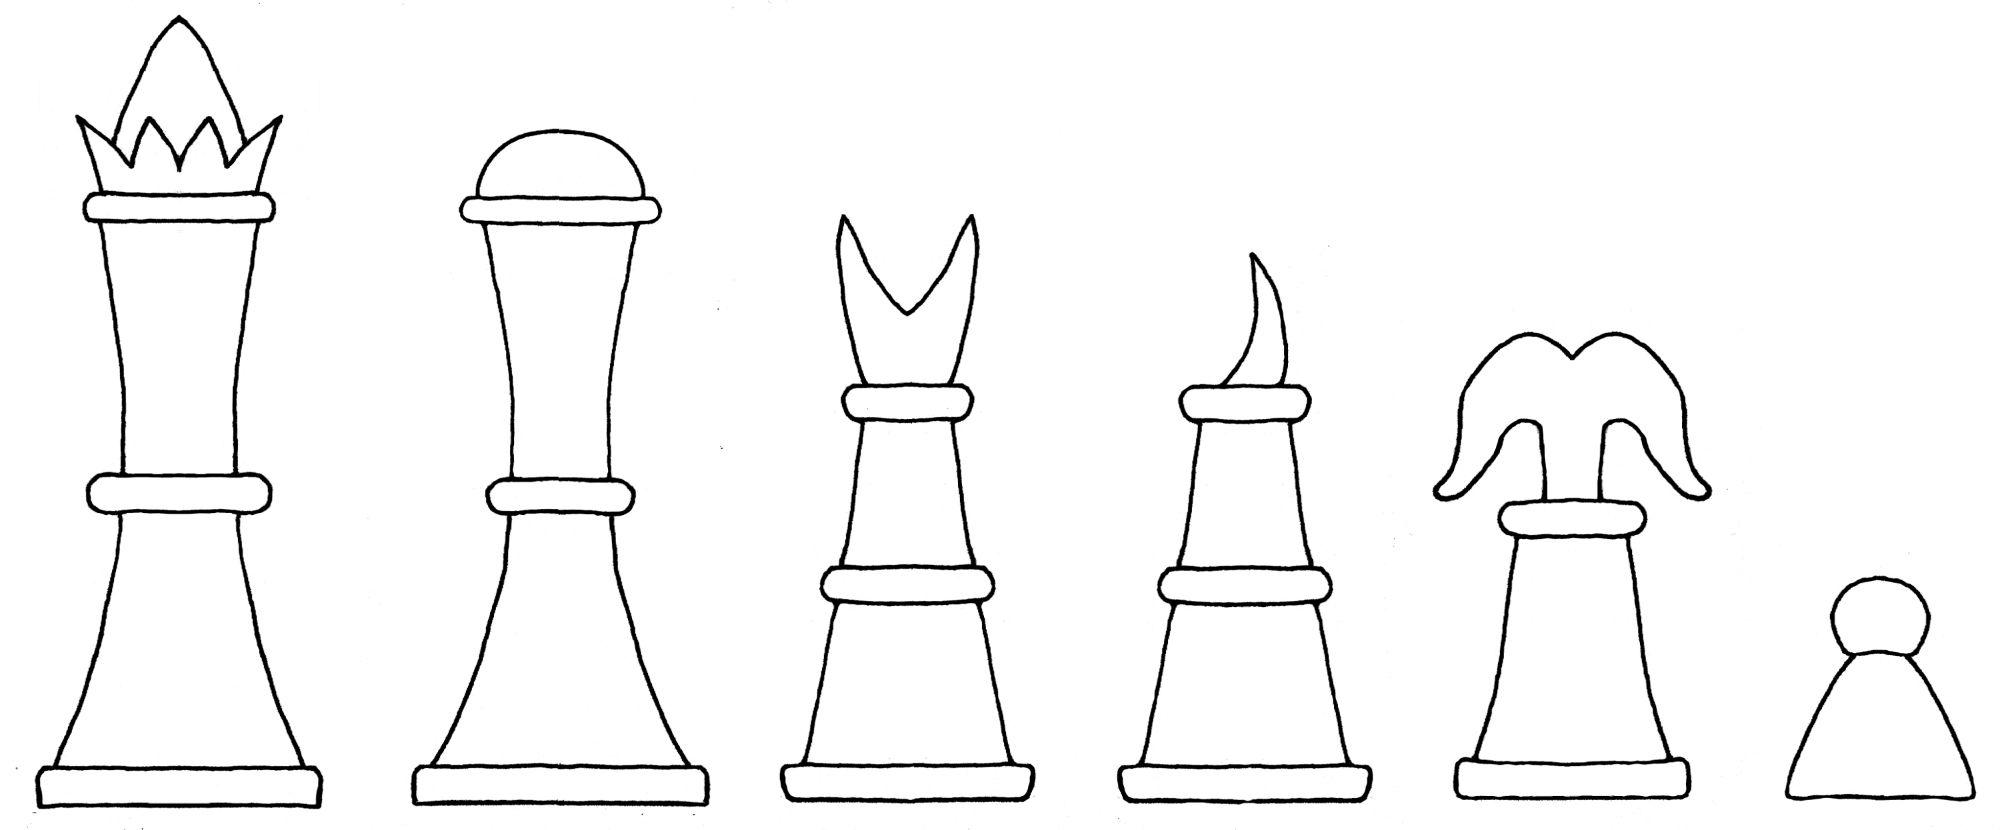 Interpretive diagram of the Publicius chess set